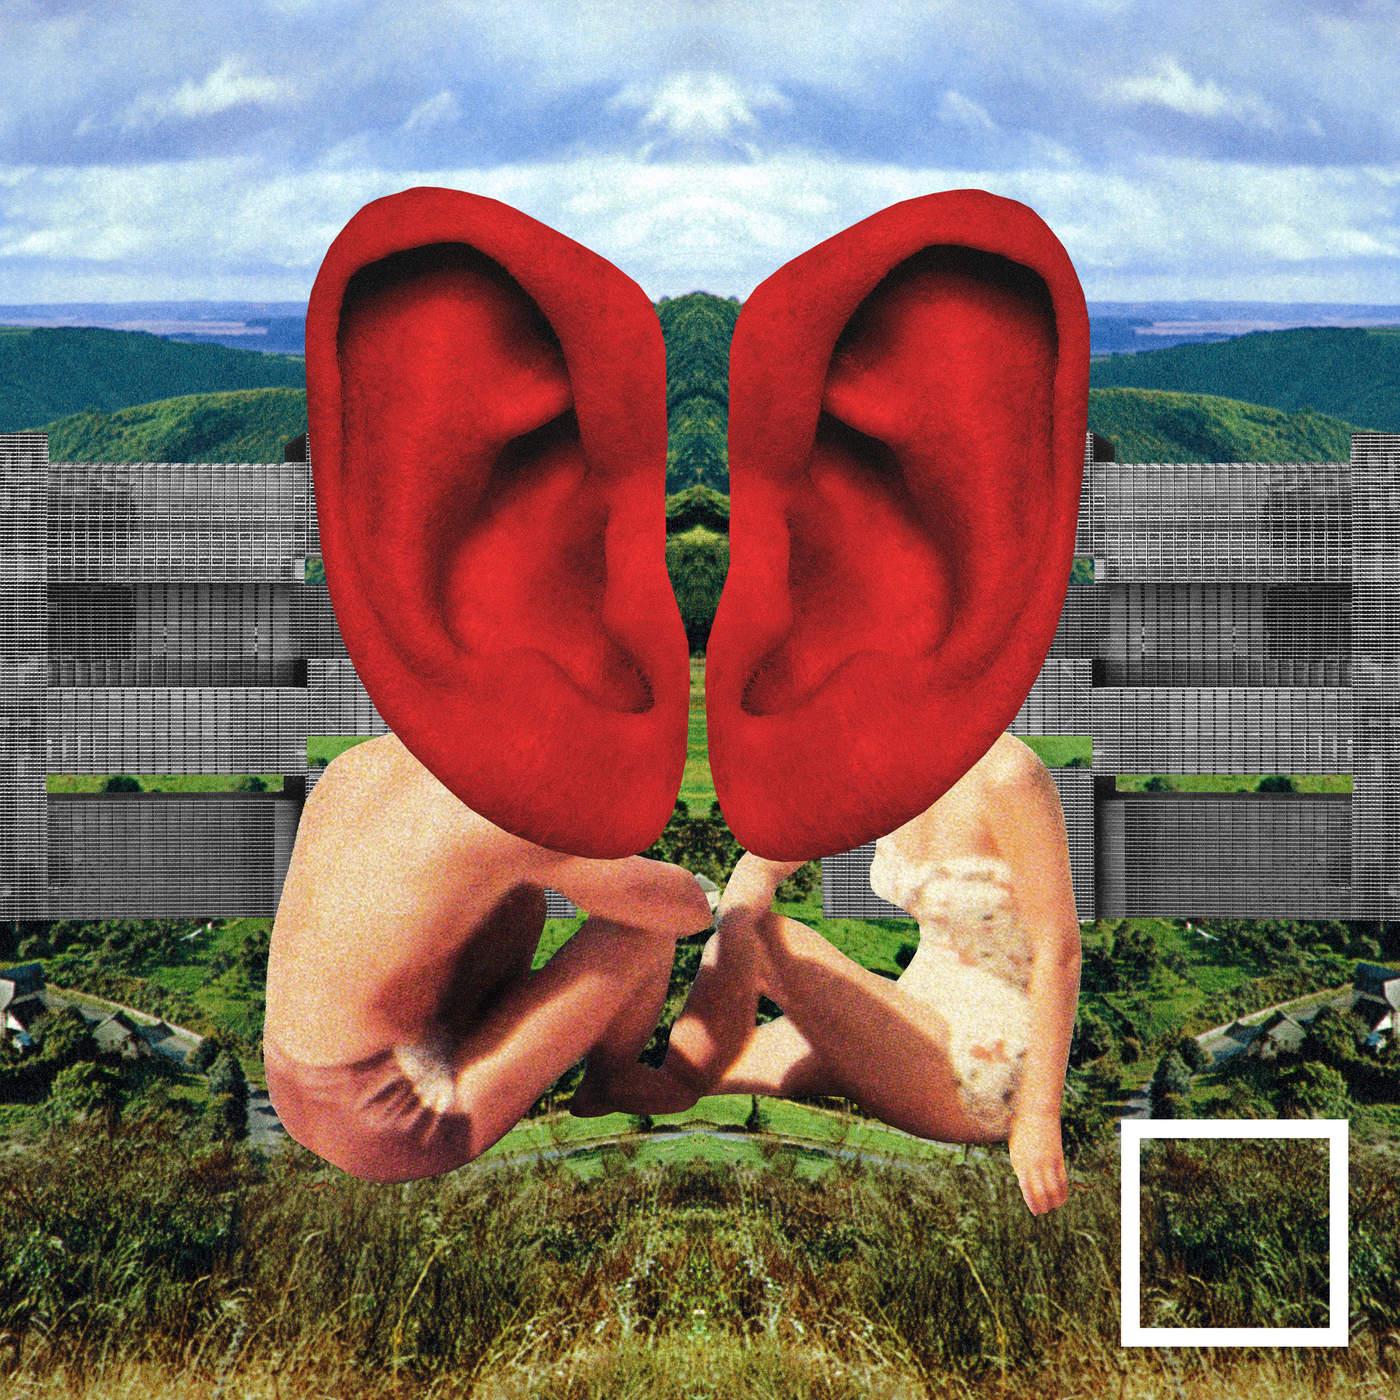 Clean Bandit - Symphony (feat. Zara Larsson) - Single Cover